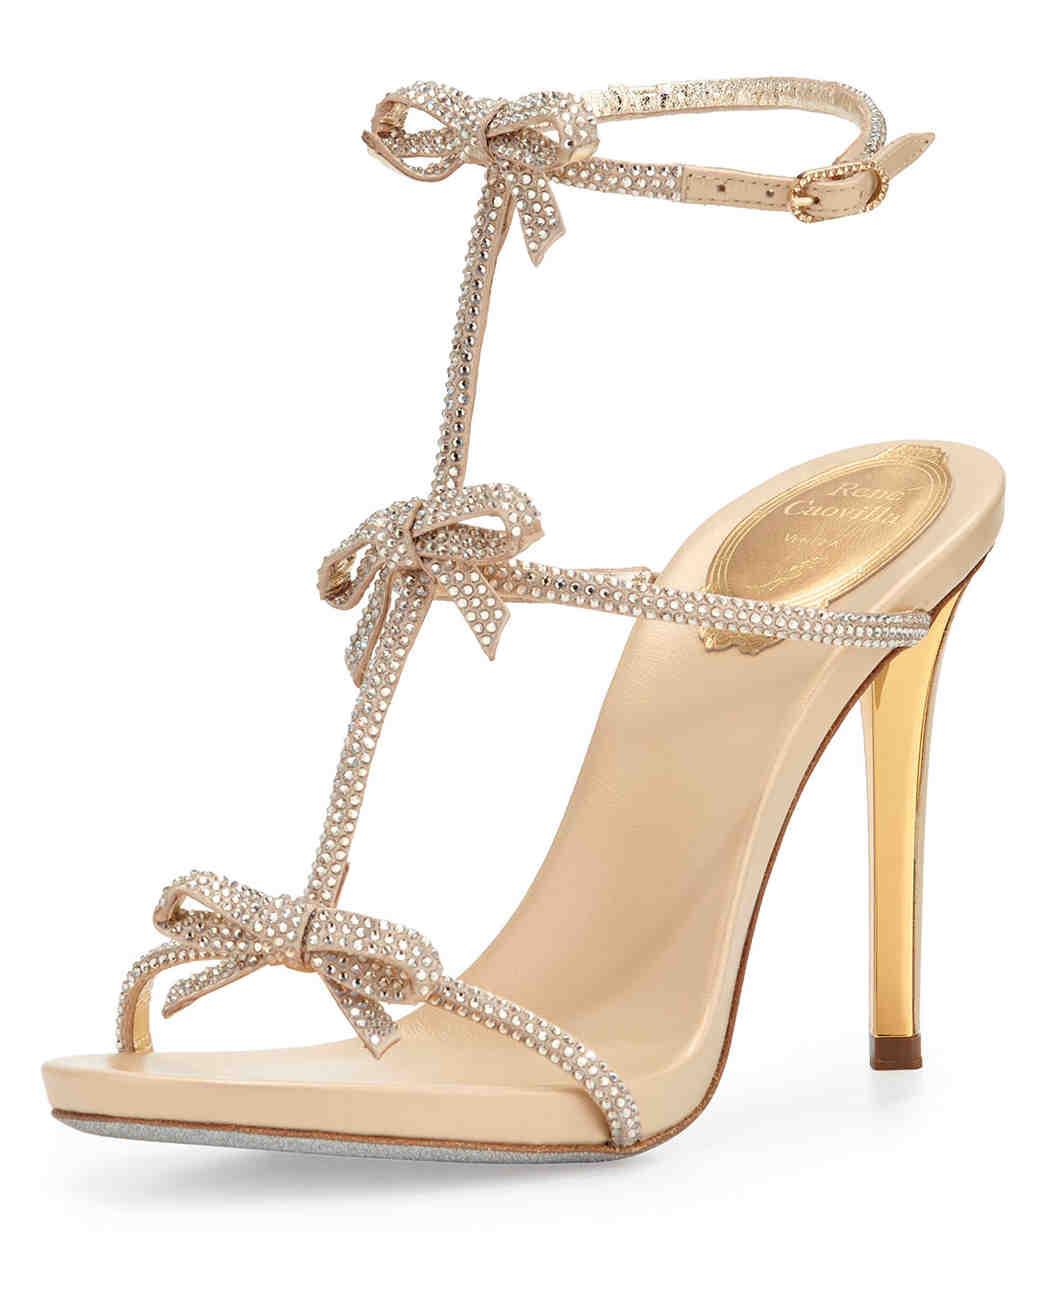 summer-wedding-shoes-rene-caovilla-strass-bow-sandals-0515.jpg